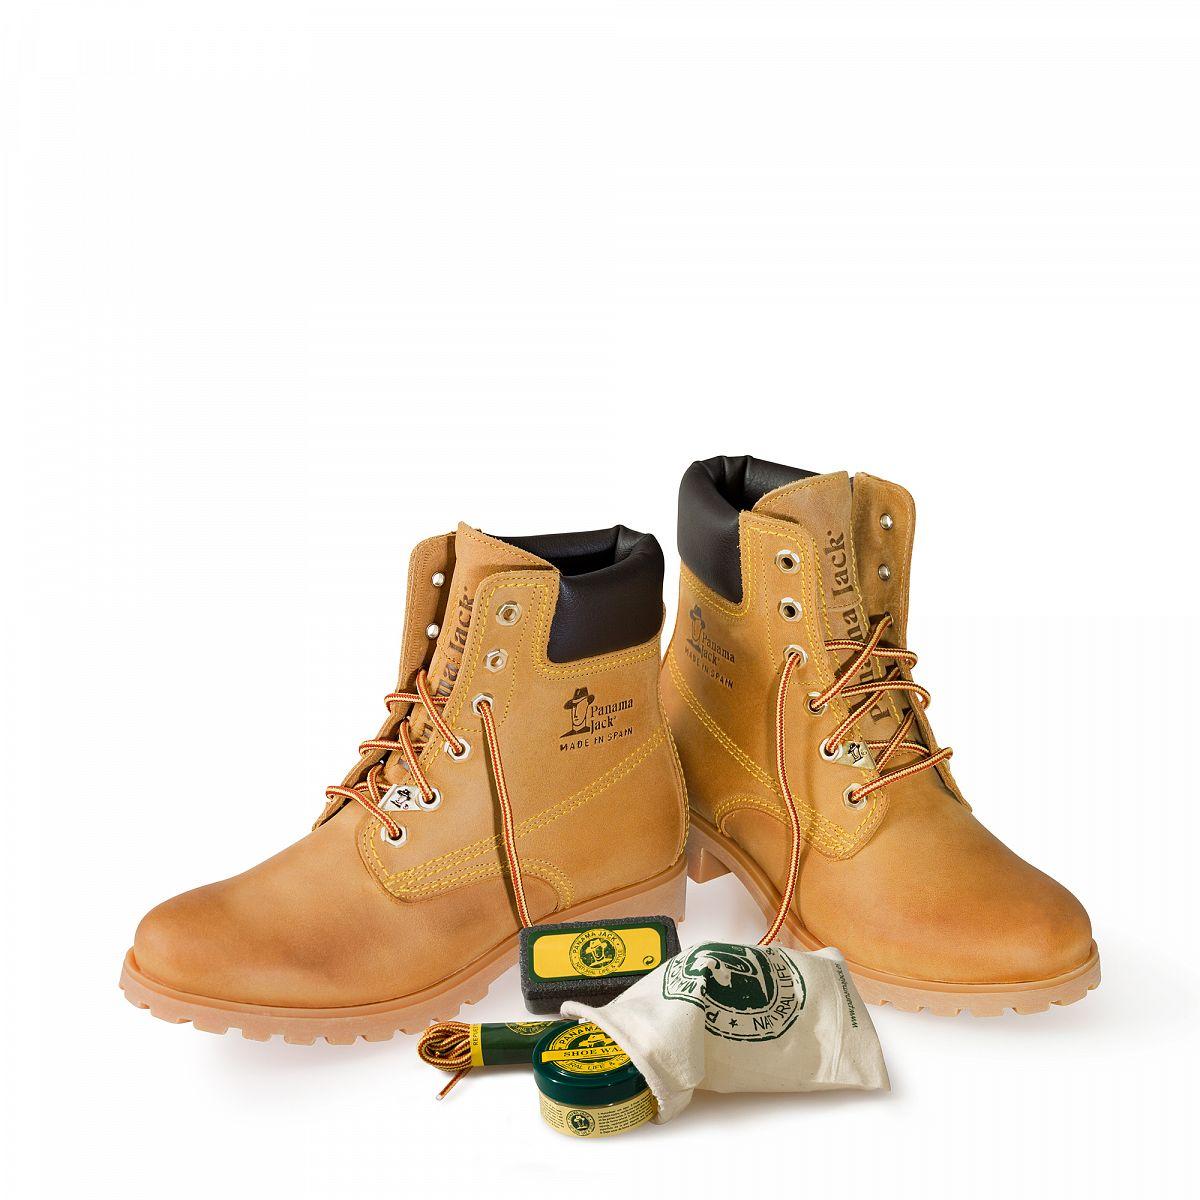 womens boots panama 03 vintage panama jack online shop. Black Bedroom Furniture Sets. Home Design Ideas